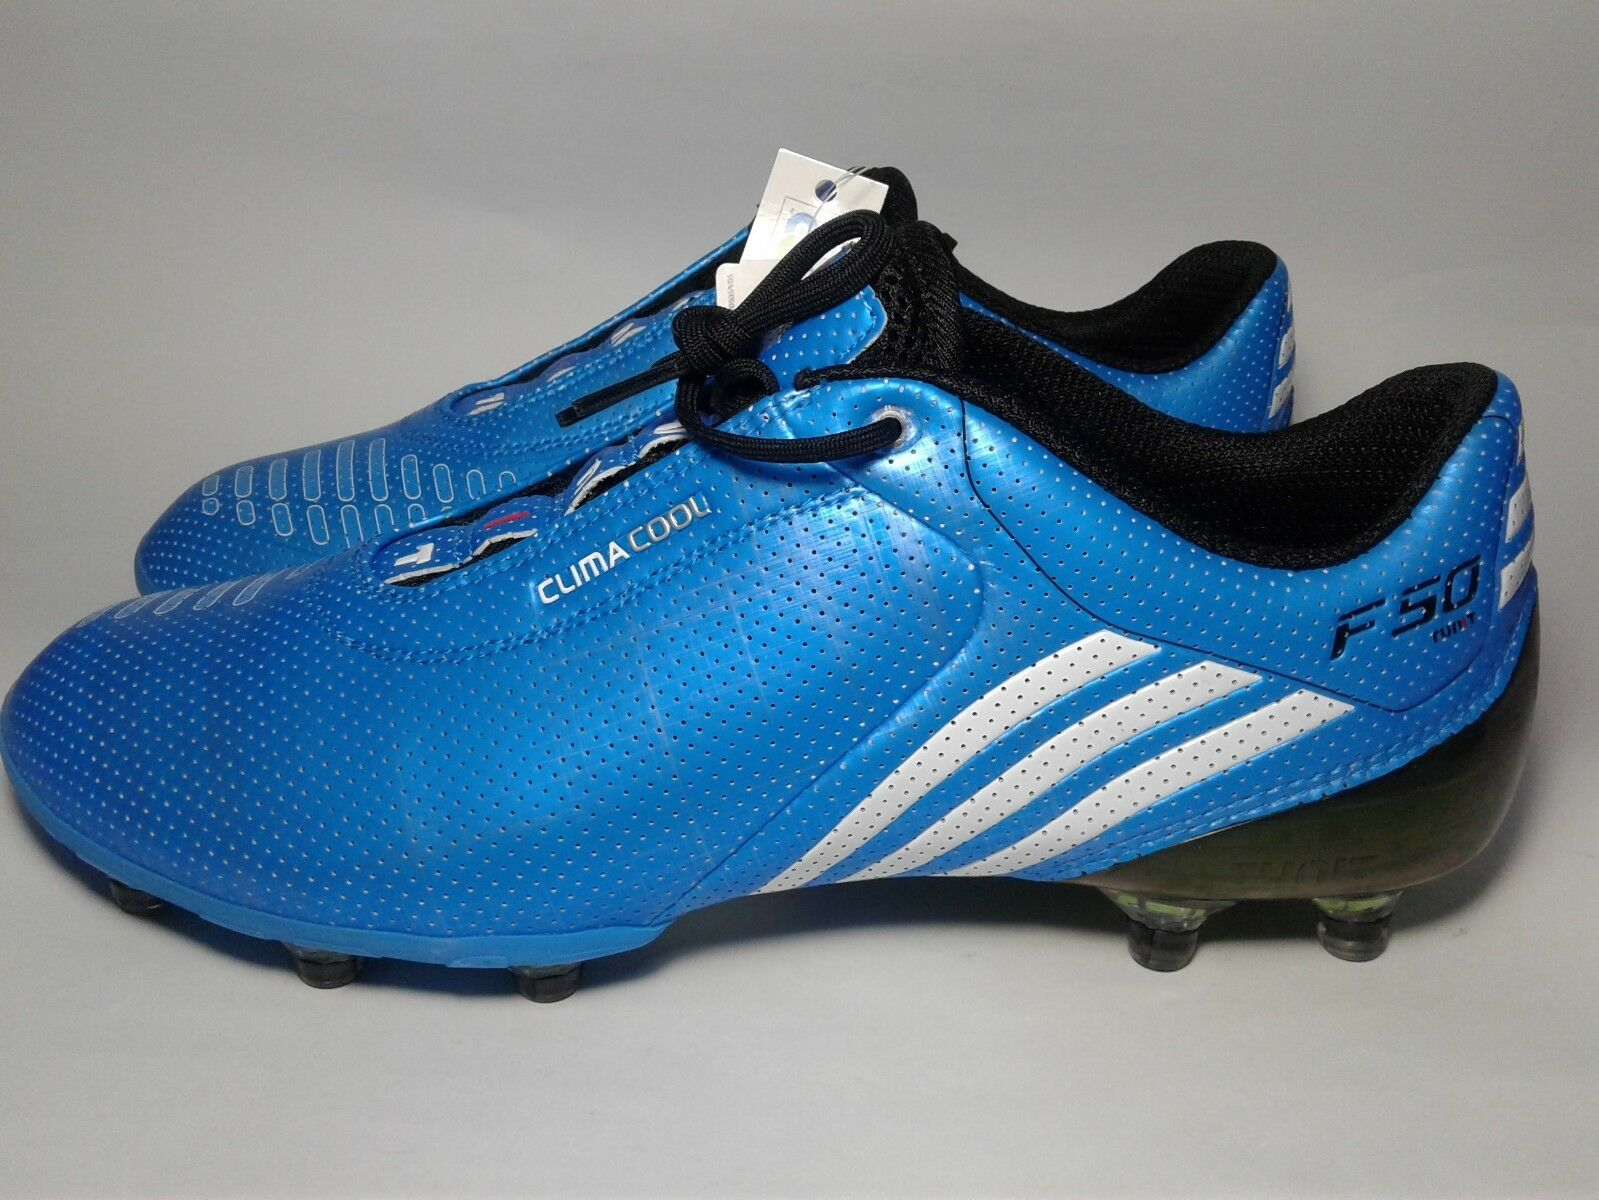 Adidas F50 I Tunit CC clemacool G02634